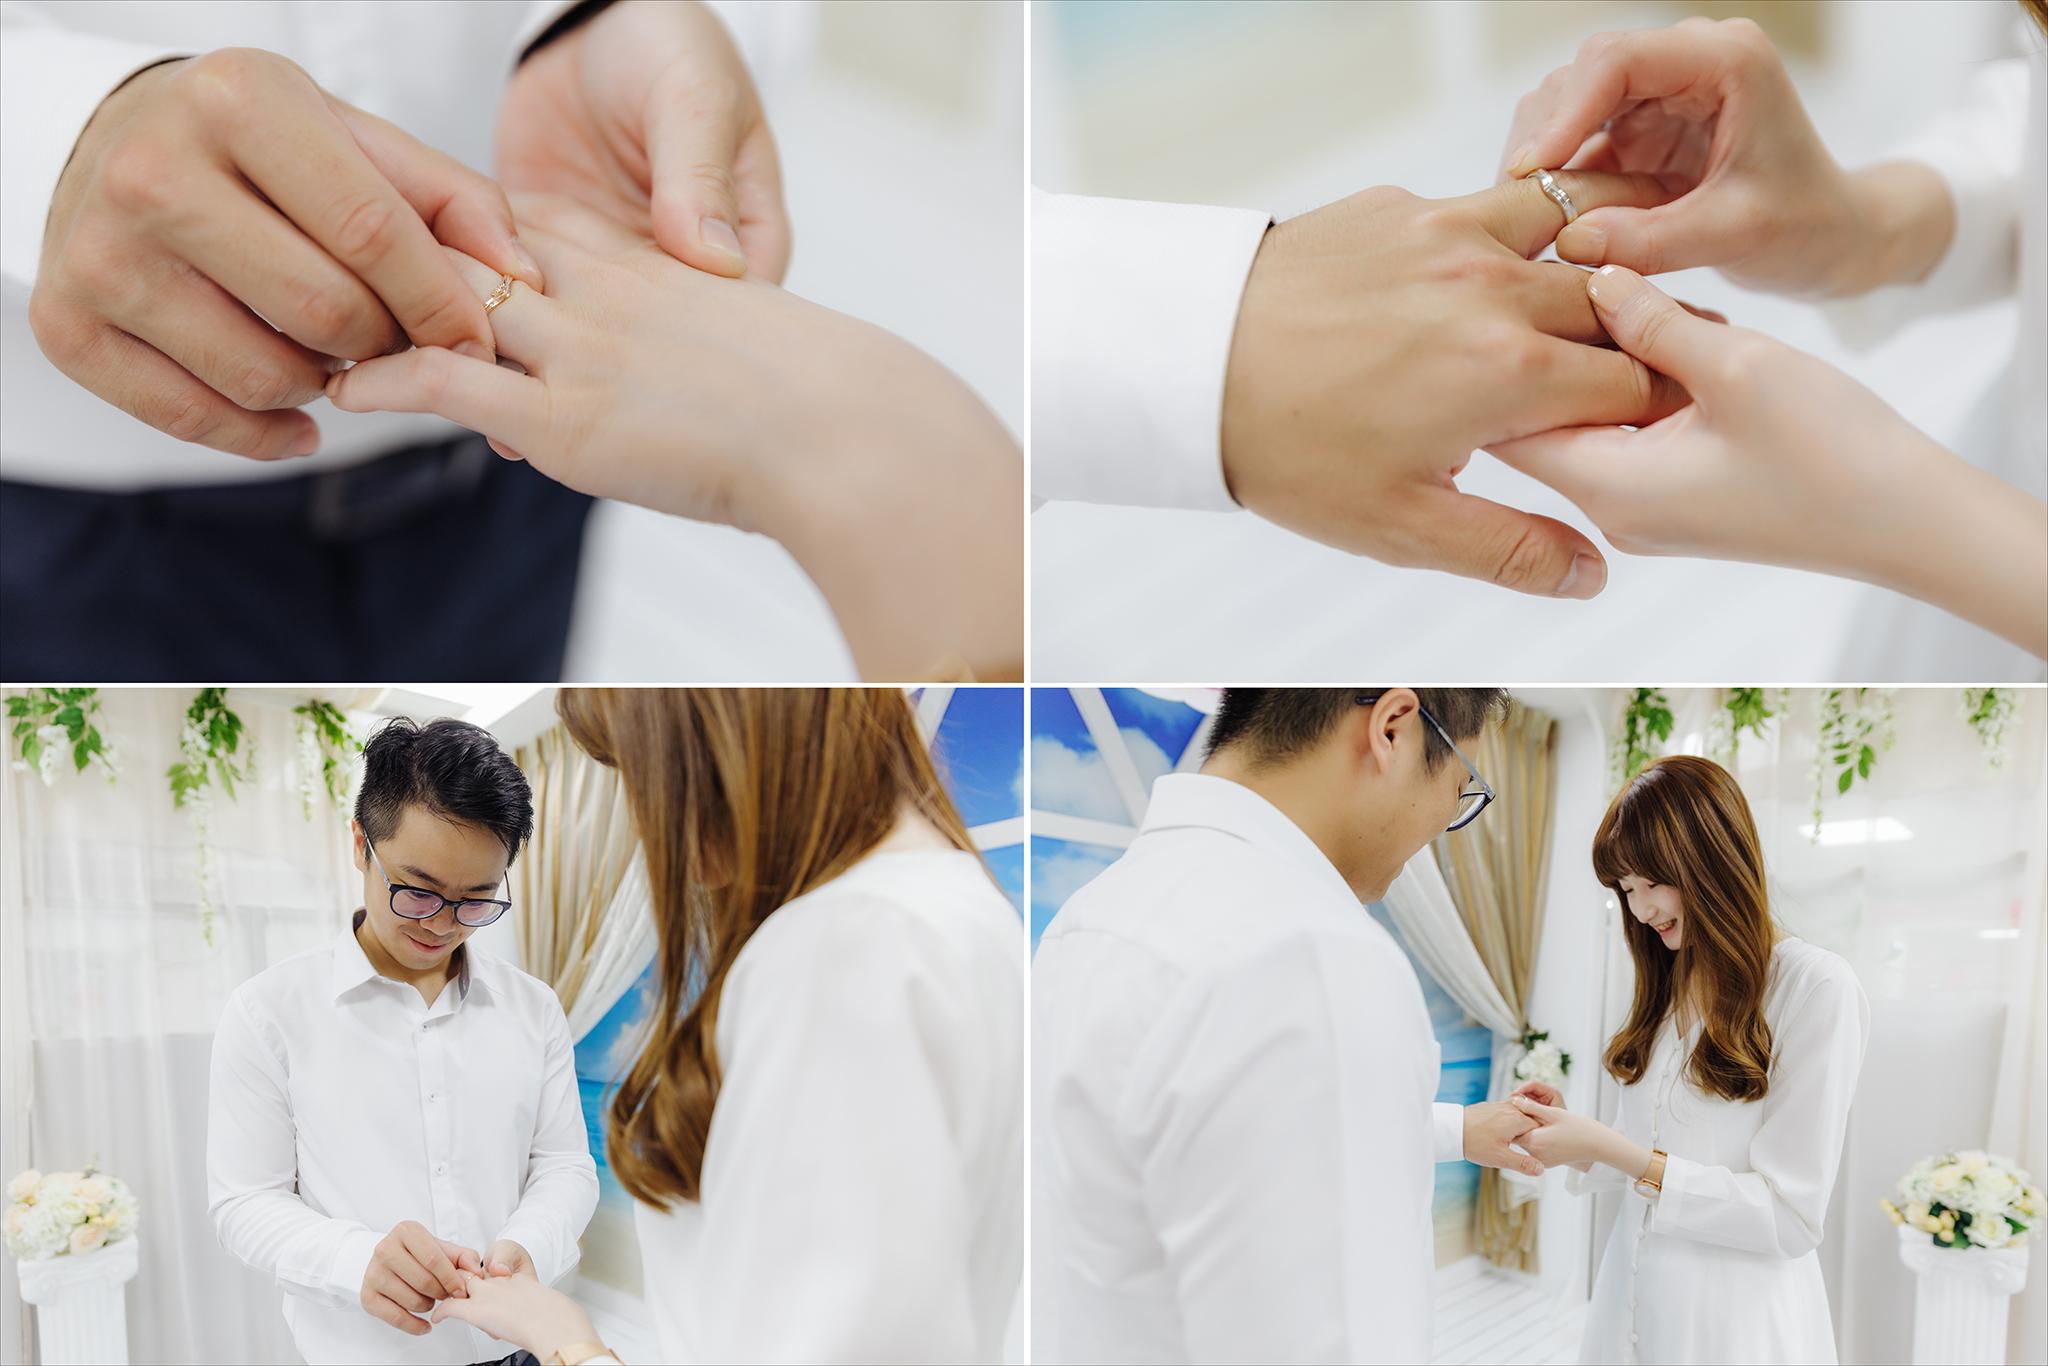 50668020272 ccbee3a4c7 o - 【證婚寫真】+宏哲&菀琳+